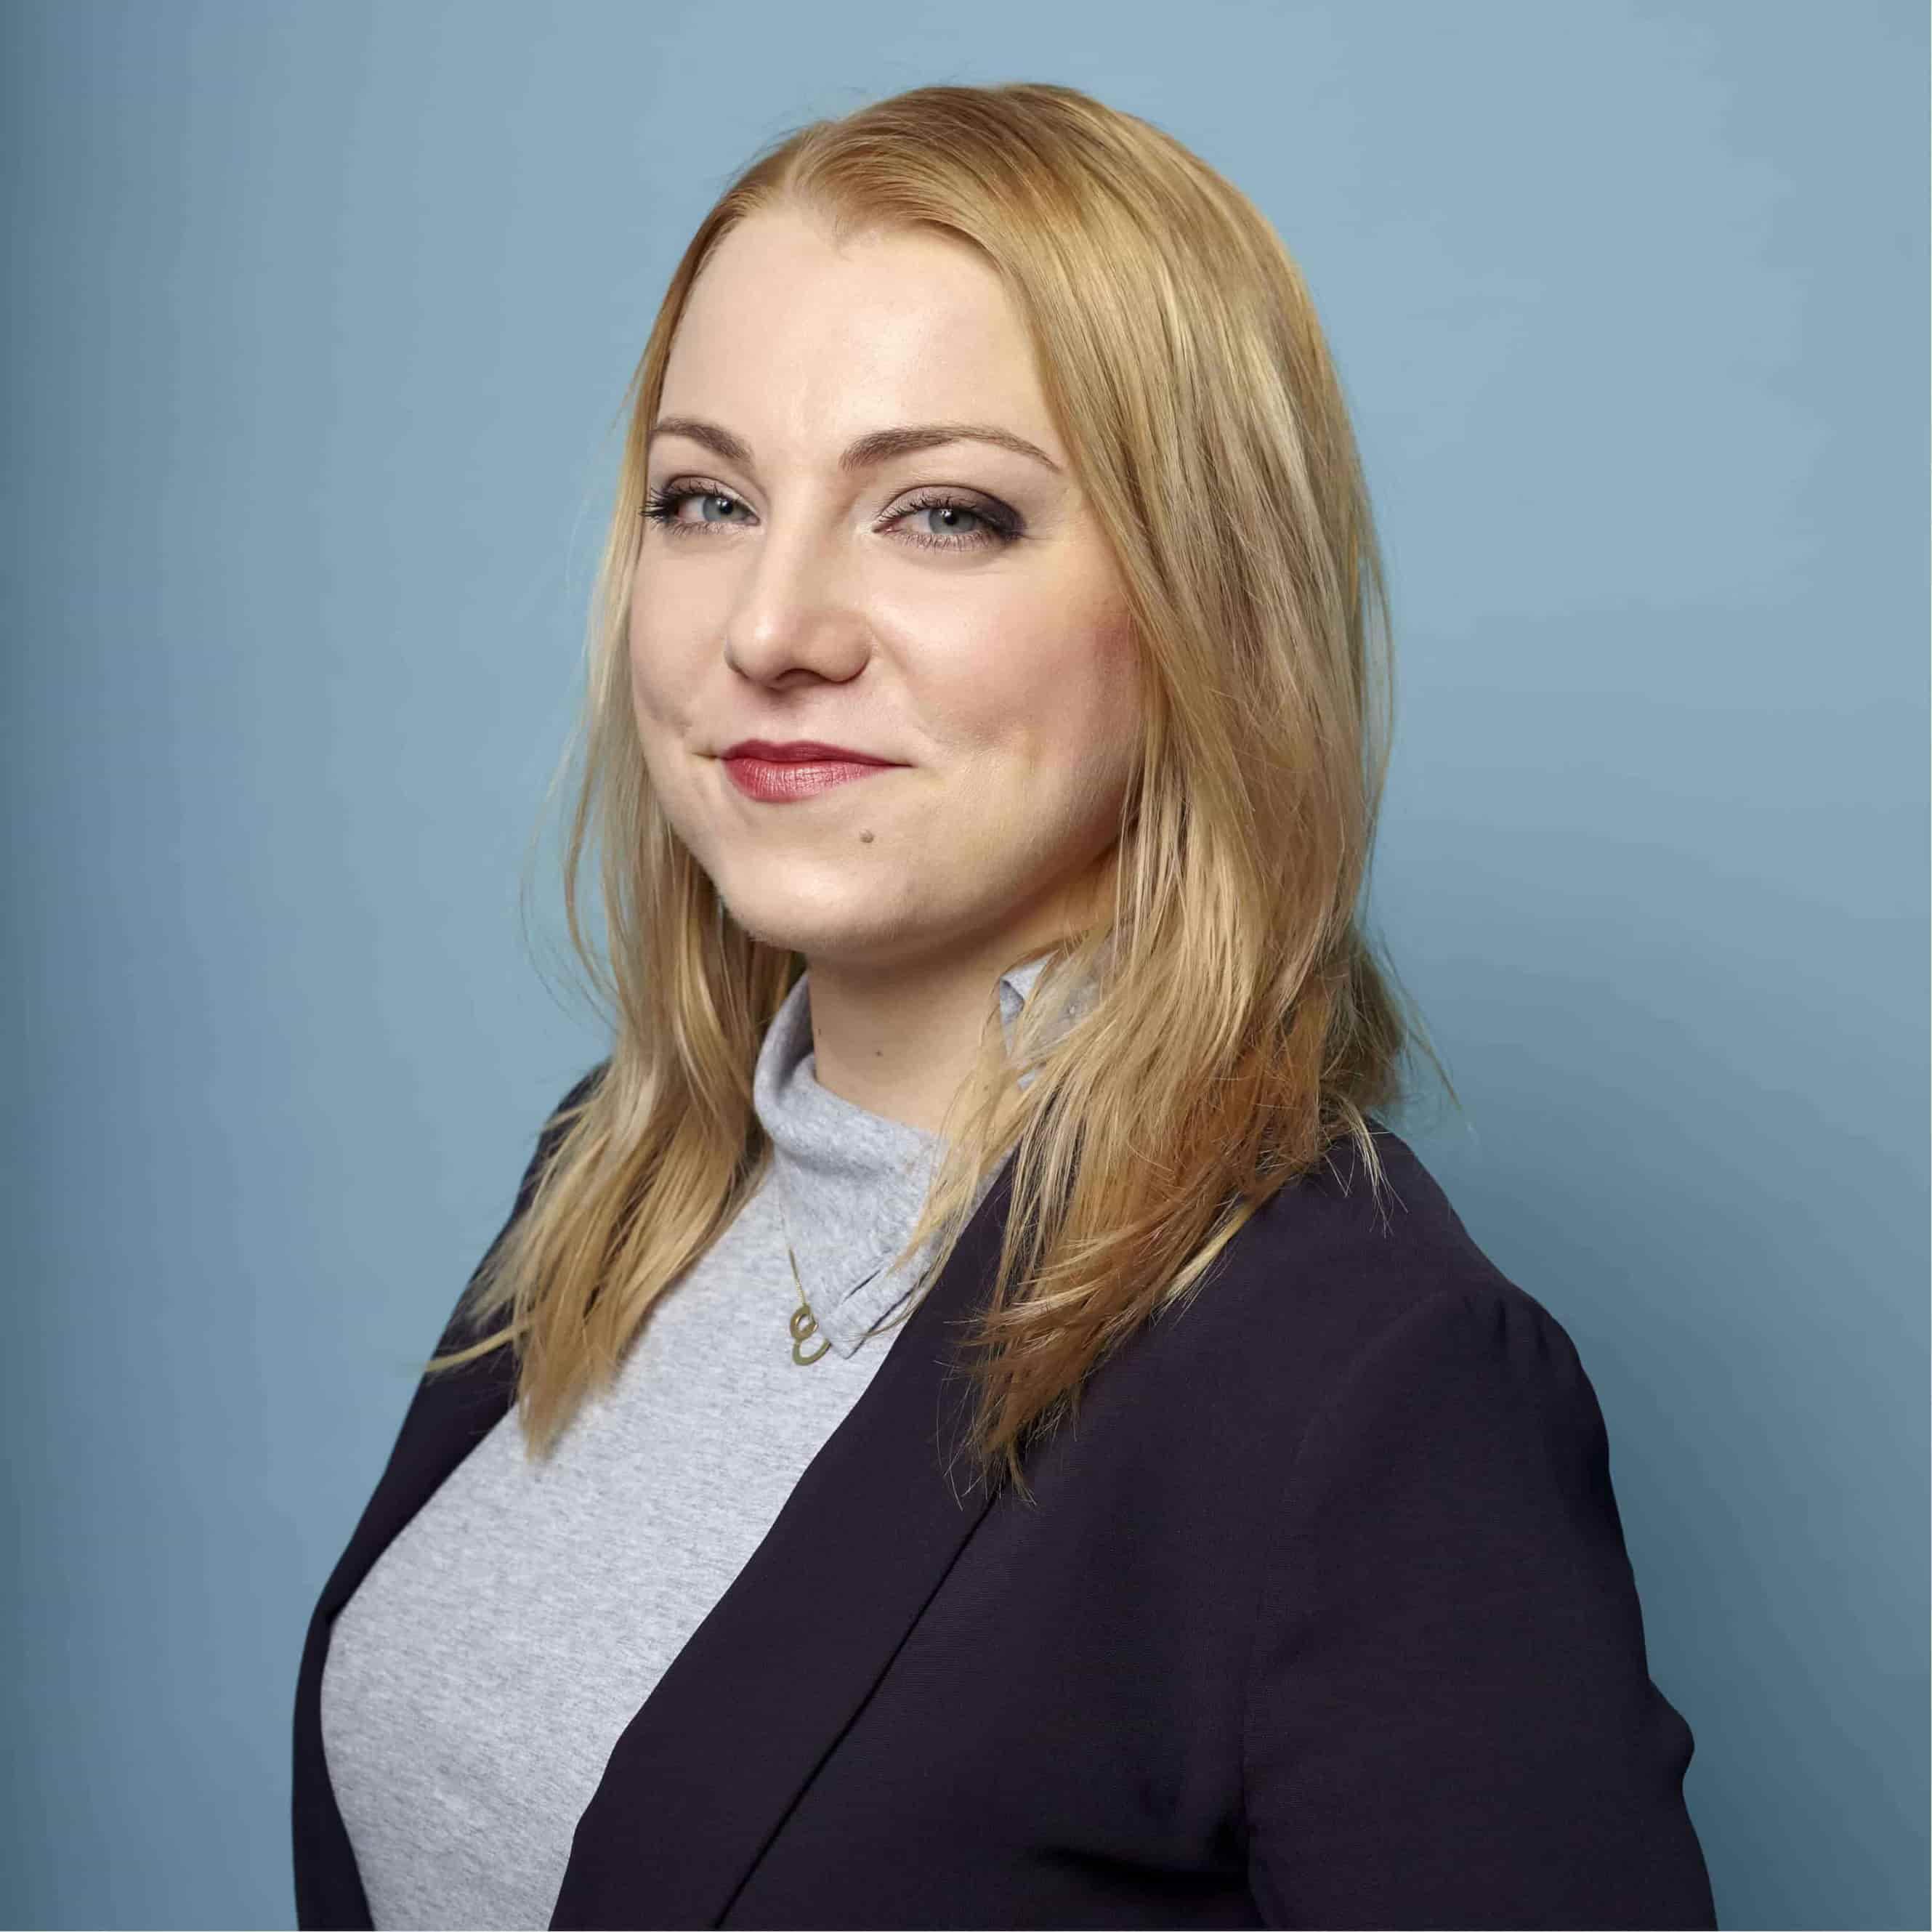 Marta Bartoszewska